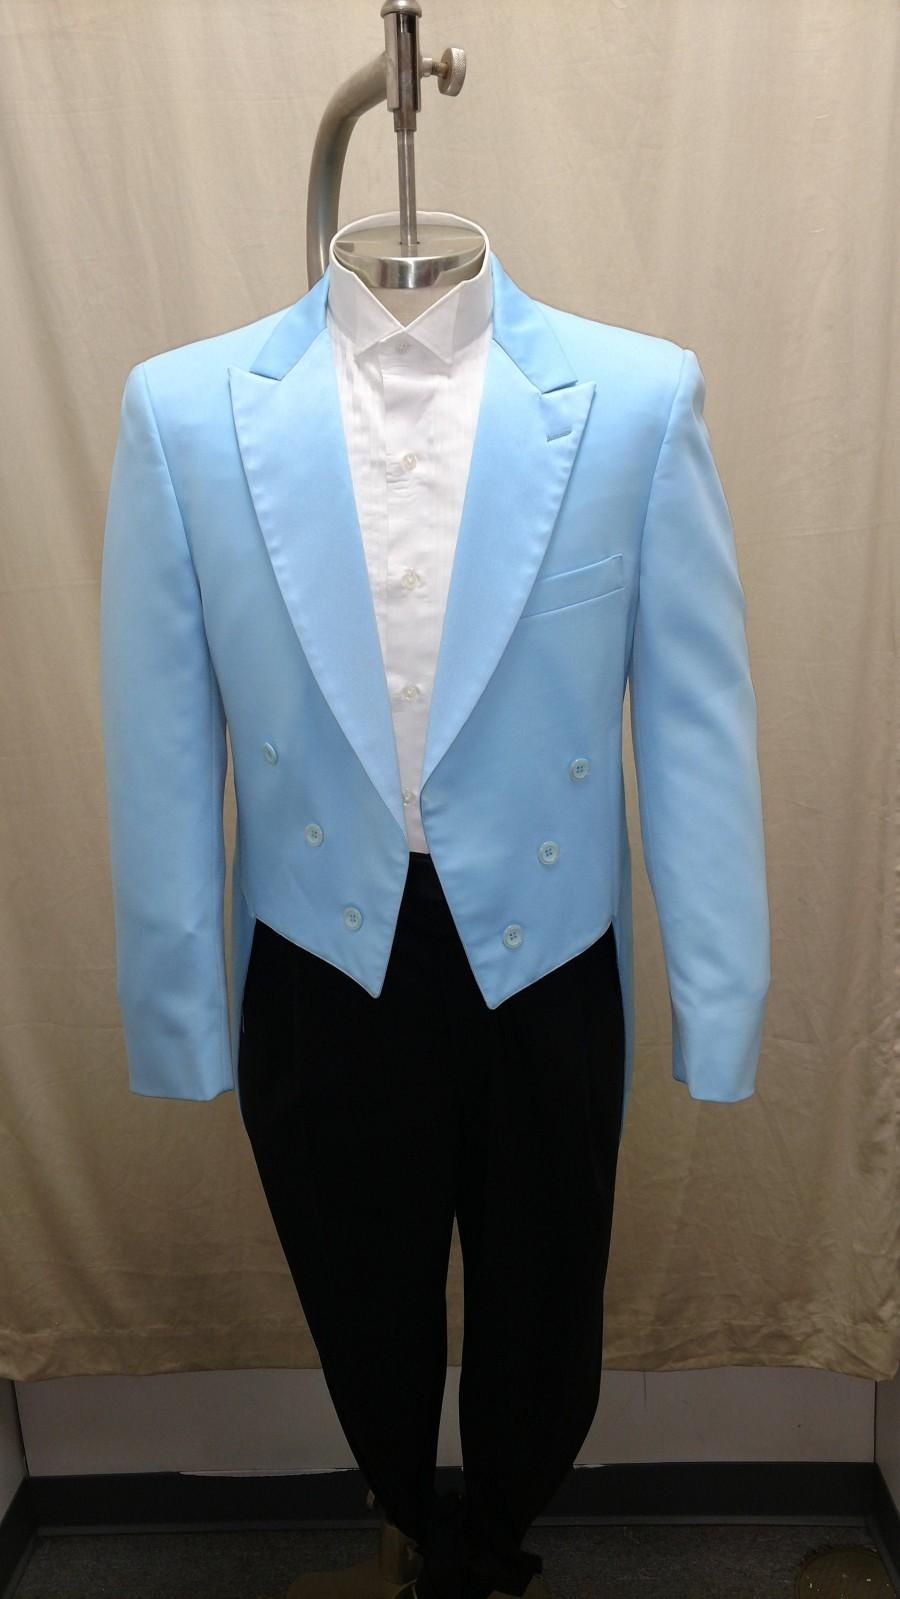 زفاف - Vintage Blue Tail Coat Tuxedo Jacket